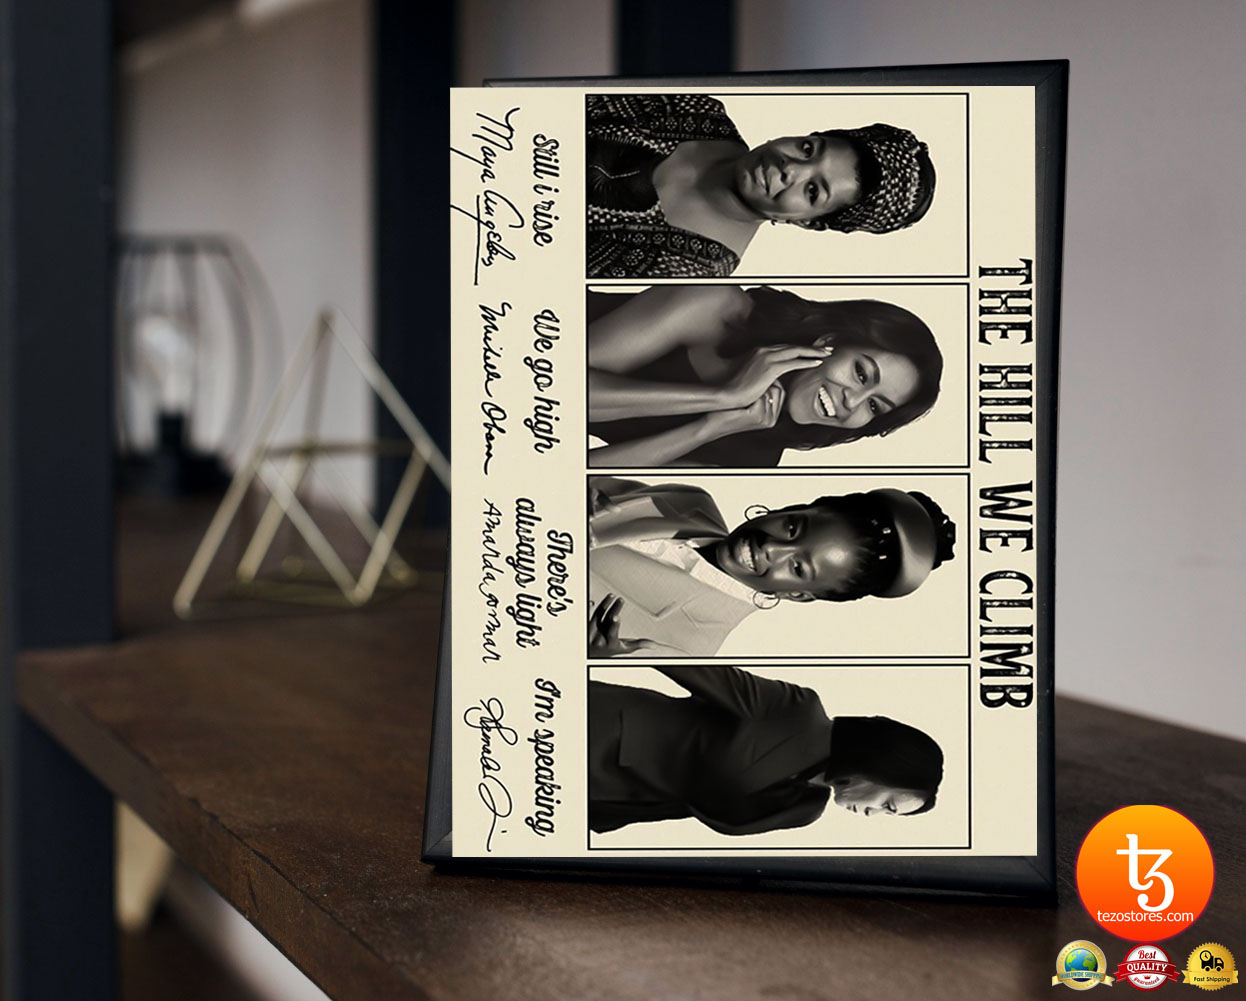 The Hill We Climb Maya Angelou, Michelle Obama, Amanda Gorman, Kamala Harris poster